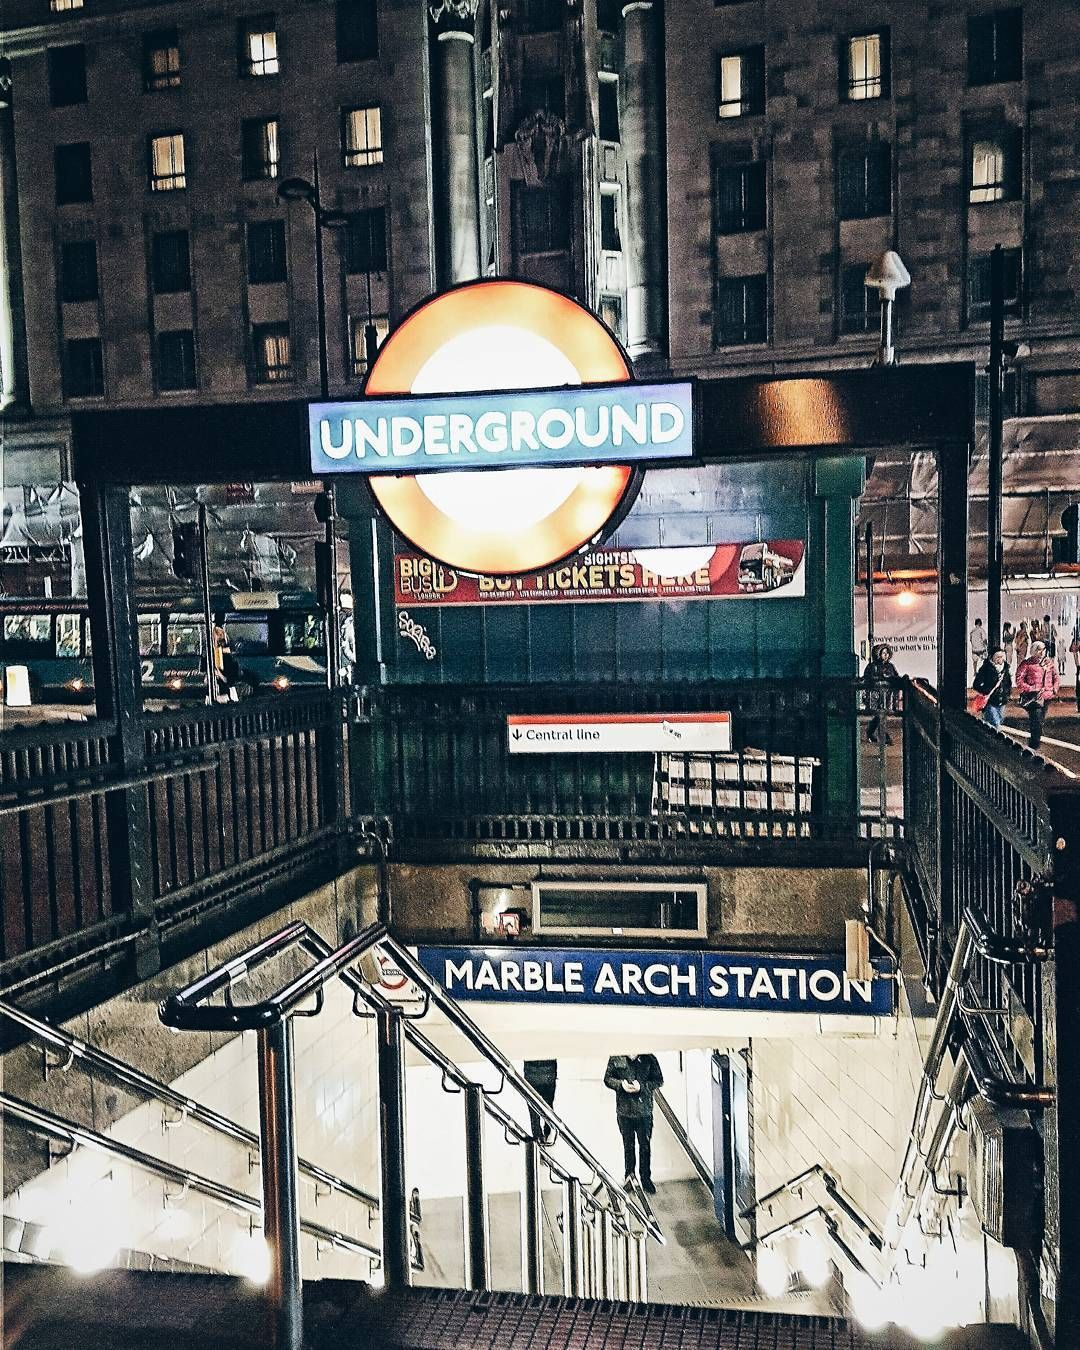 Marblearch Marblearchstation London Londonnights Tube Londonunderground Londontube Underground Mainthegap Marble Arch London Underground London Tube